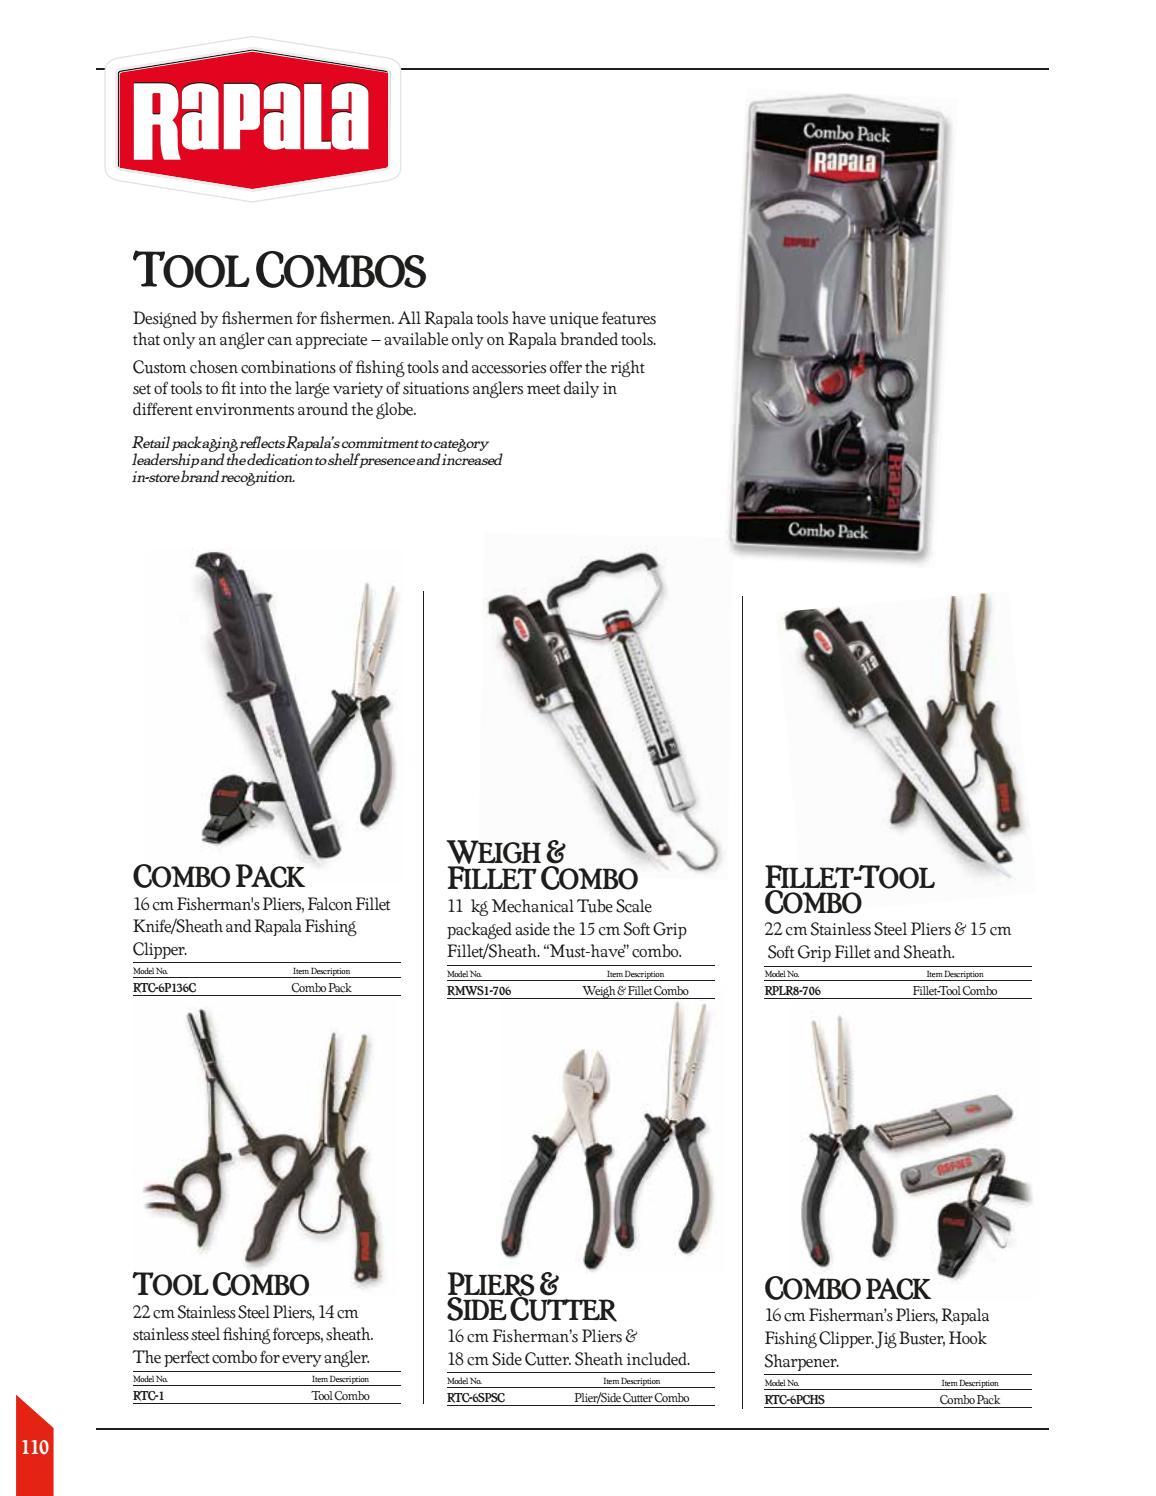 RAPALA Tool Combo Plier//Forcepts RTC-1